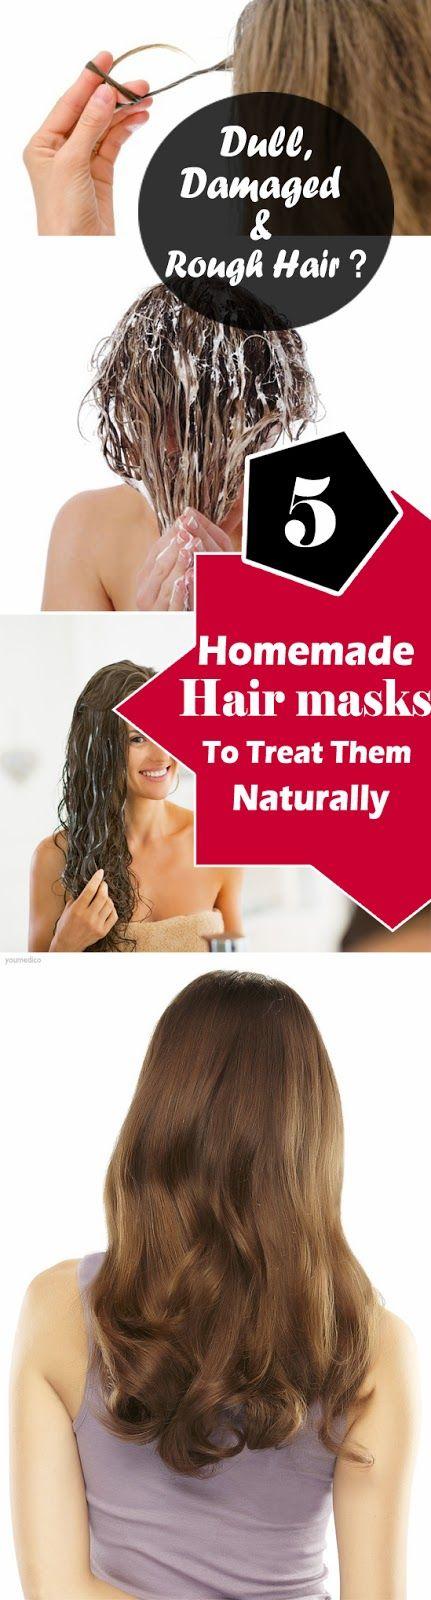 5 Homemade Natural Hair Masks to Treat Dull, Dry, Rough and Damaged Hair